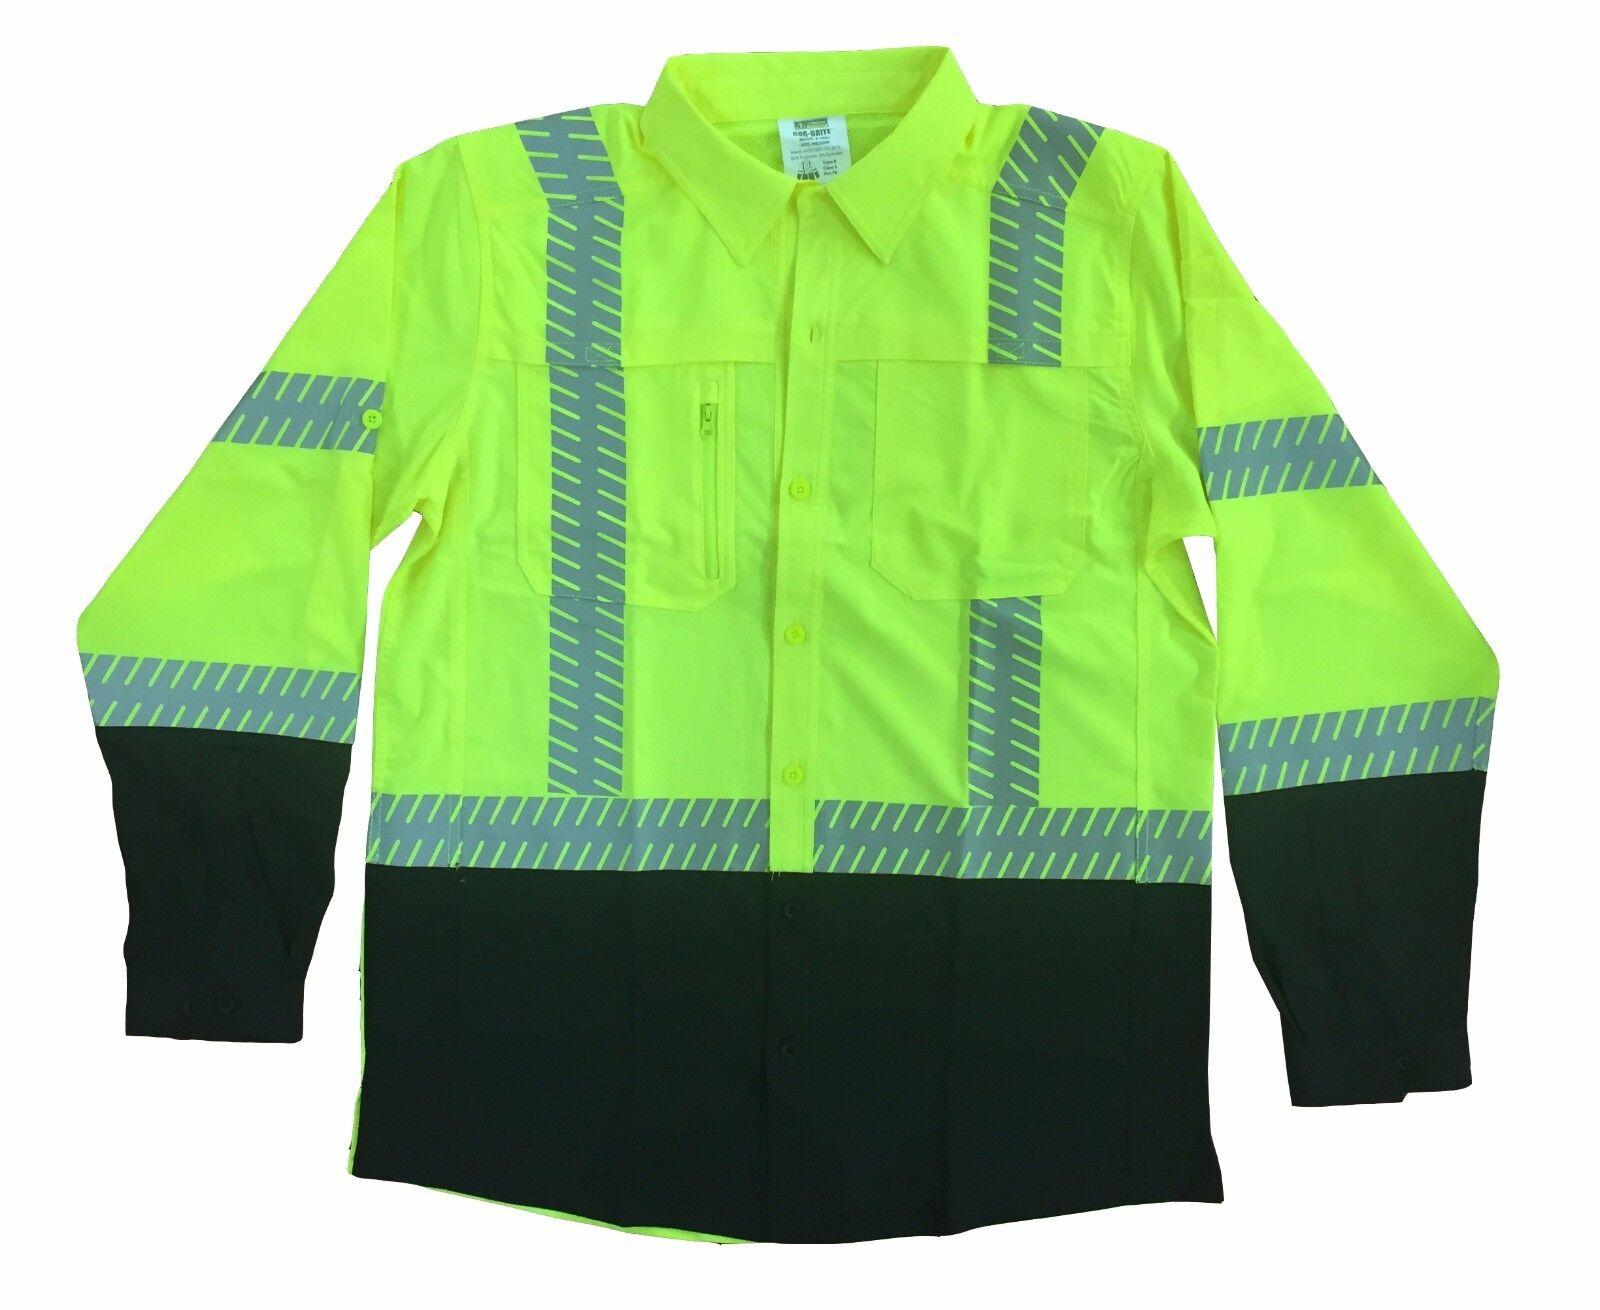 Class 3 Hi-Viz Lime Grün Foreman Work Shirts With Collar Reflective Long Sleeve